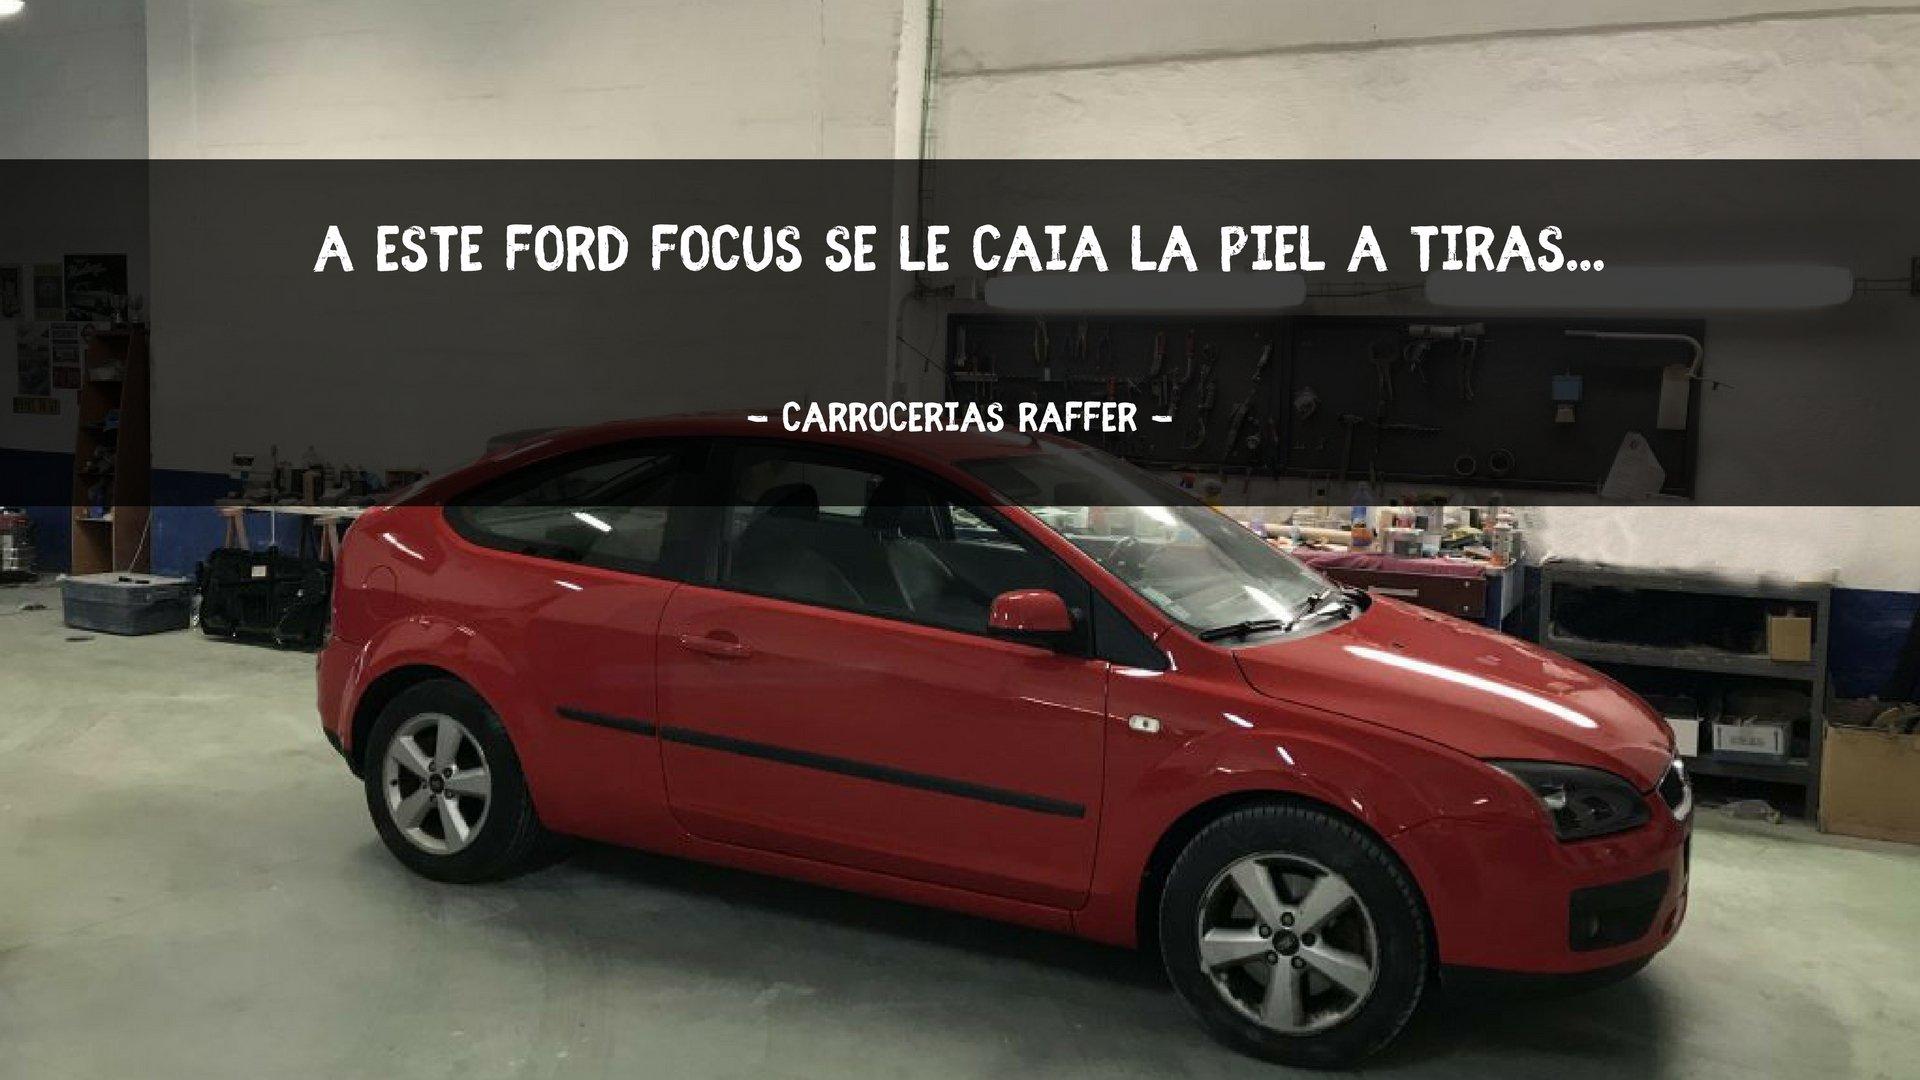 0 portada carrocerias raffer ford focus rojo se le cae la piel a tiras 1